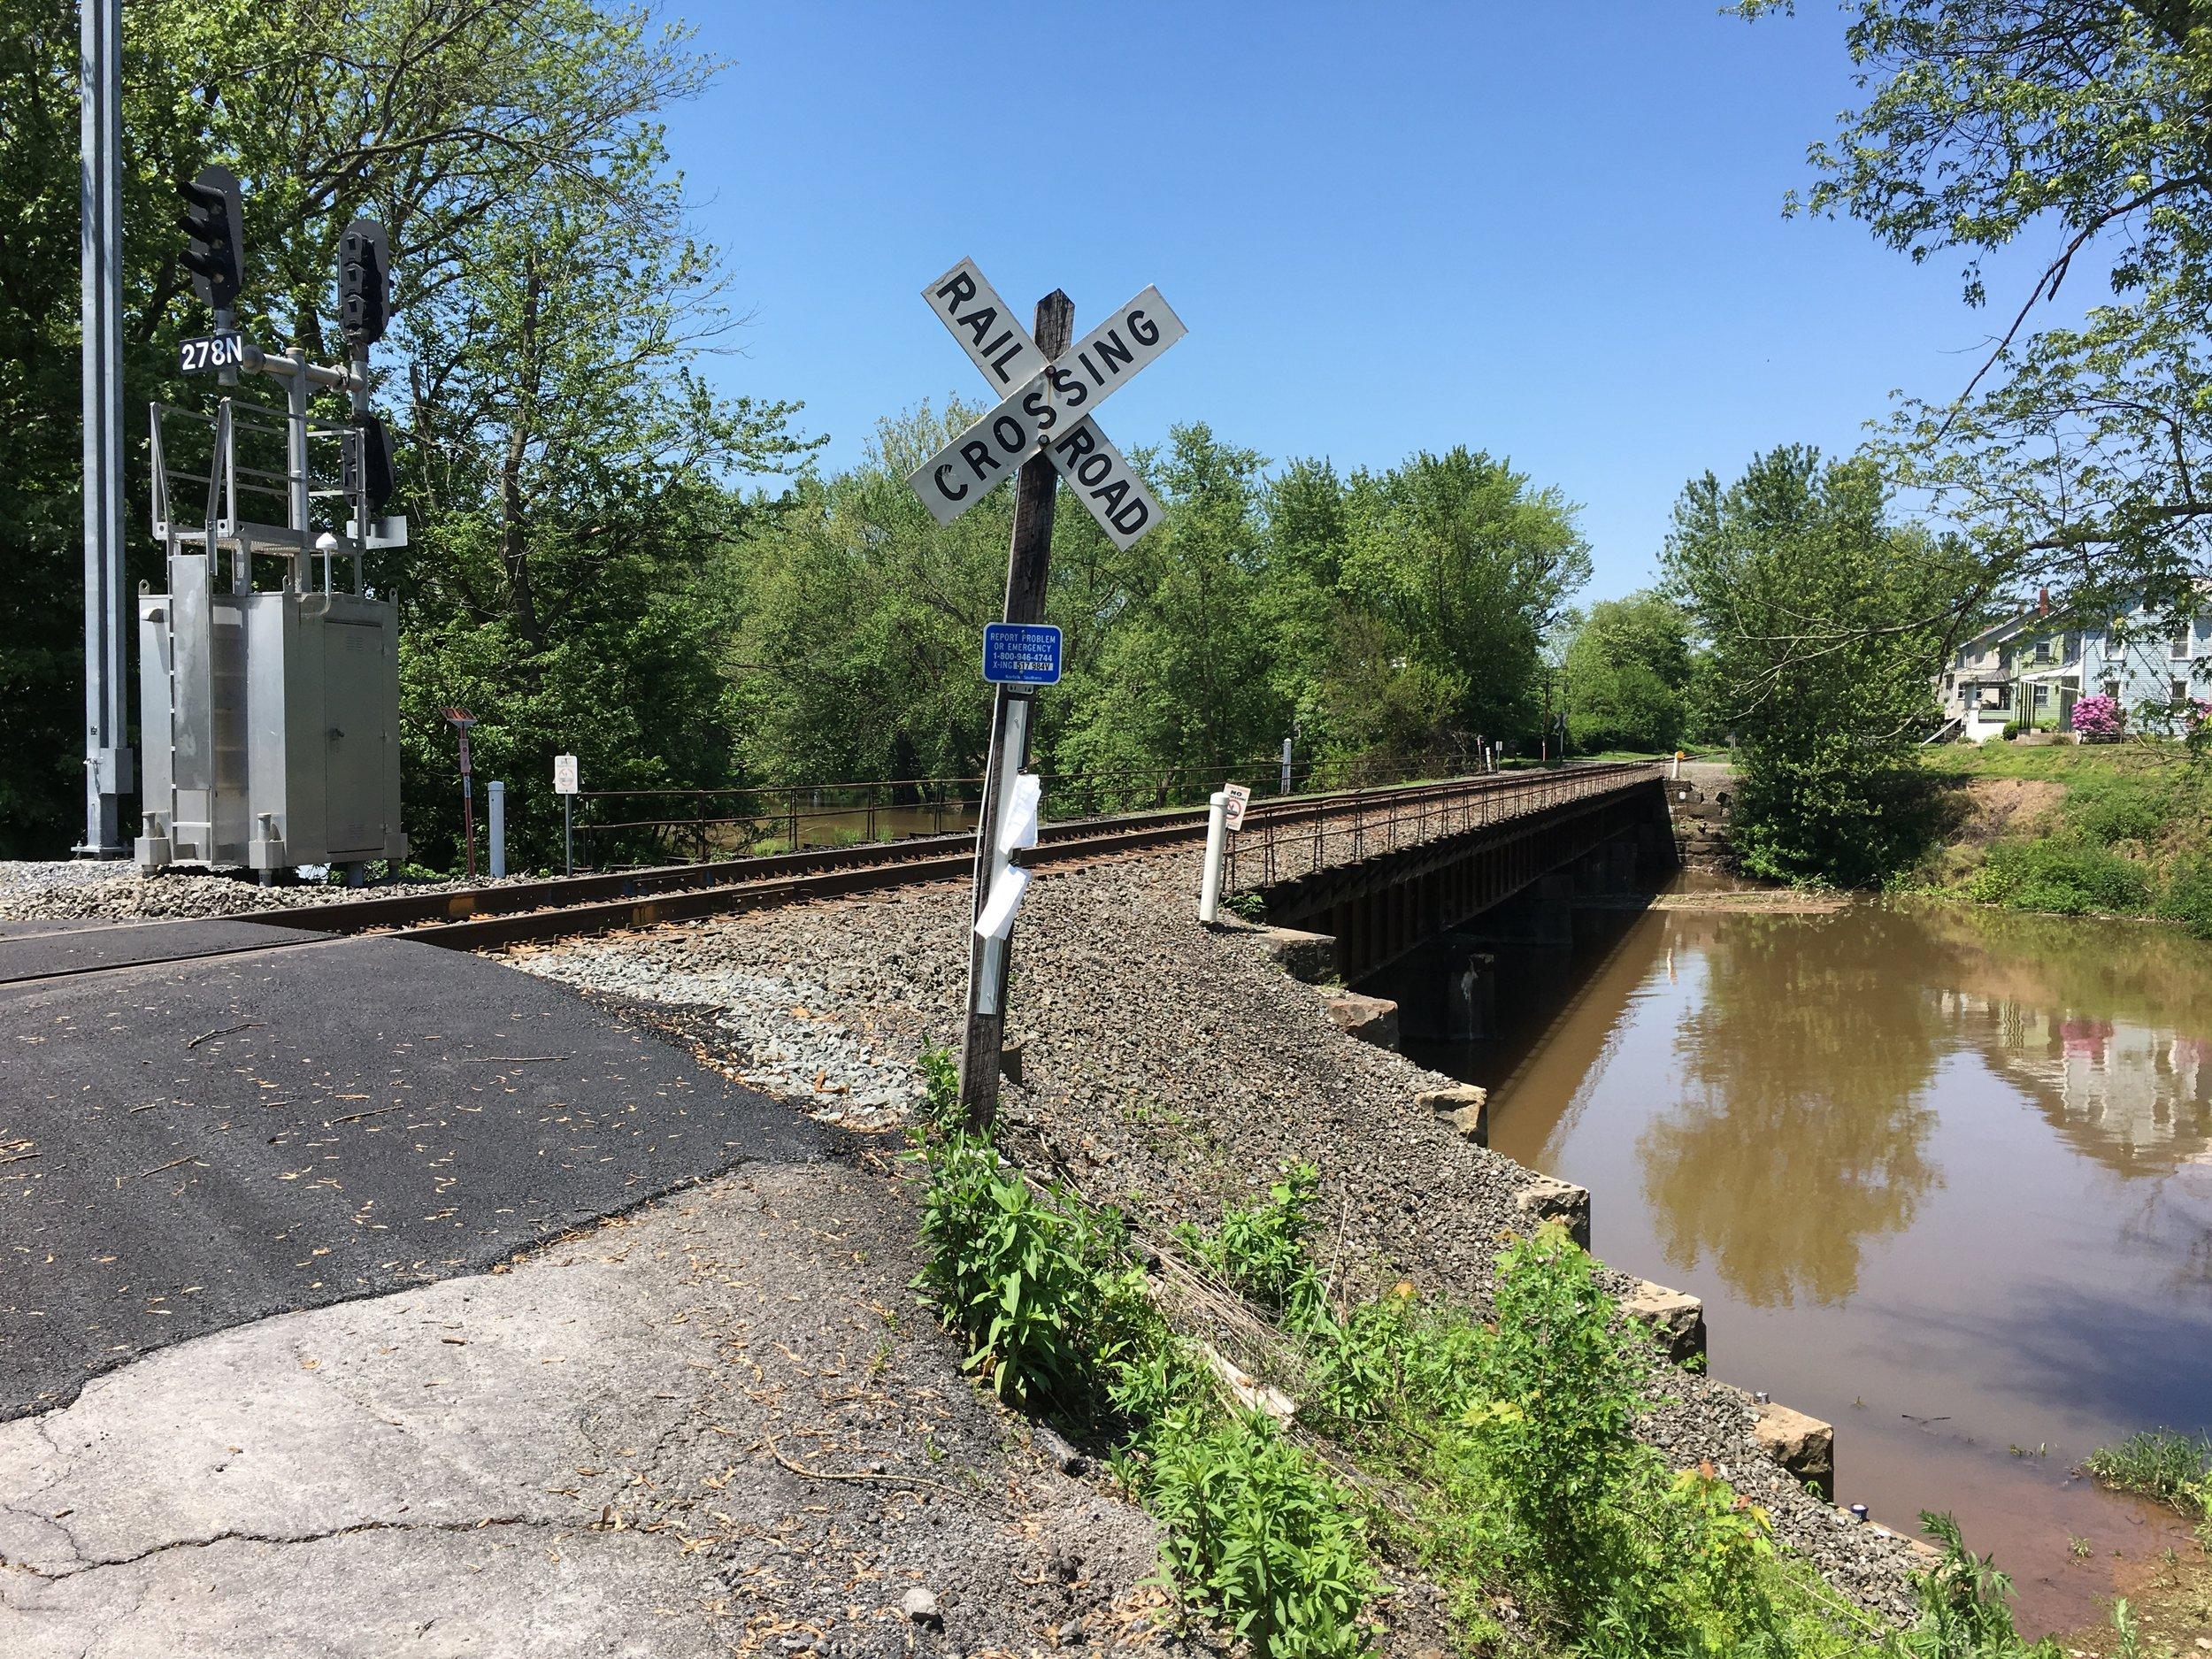 Mahantango Creek railroad bridge and crossing, northern Dauphin County